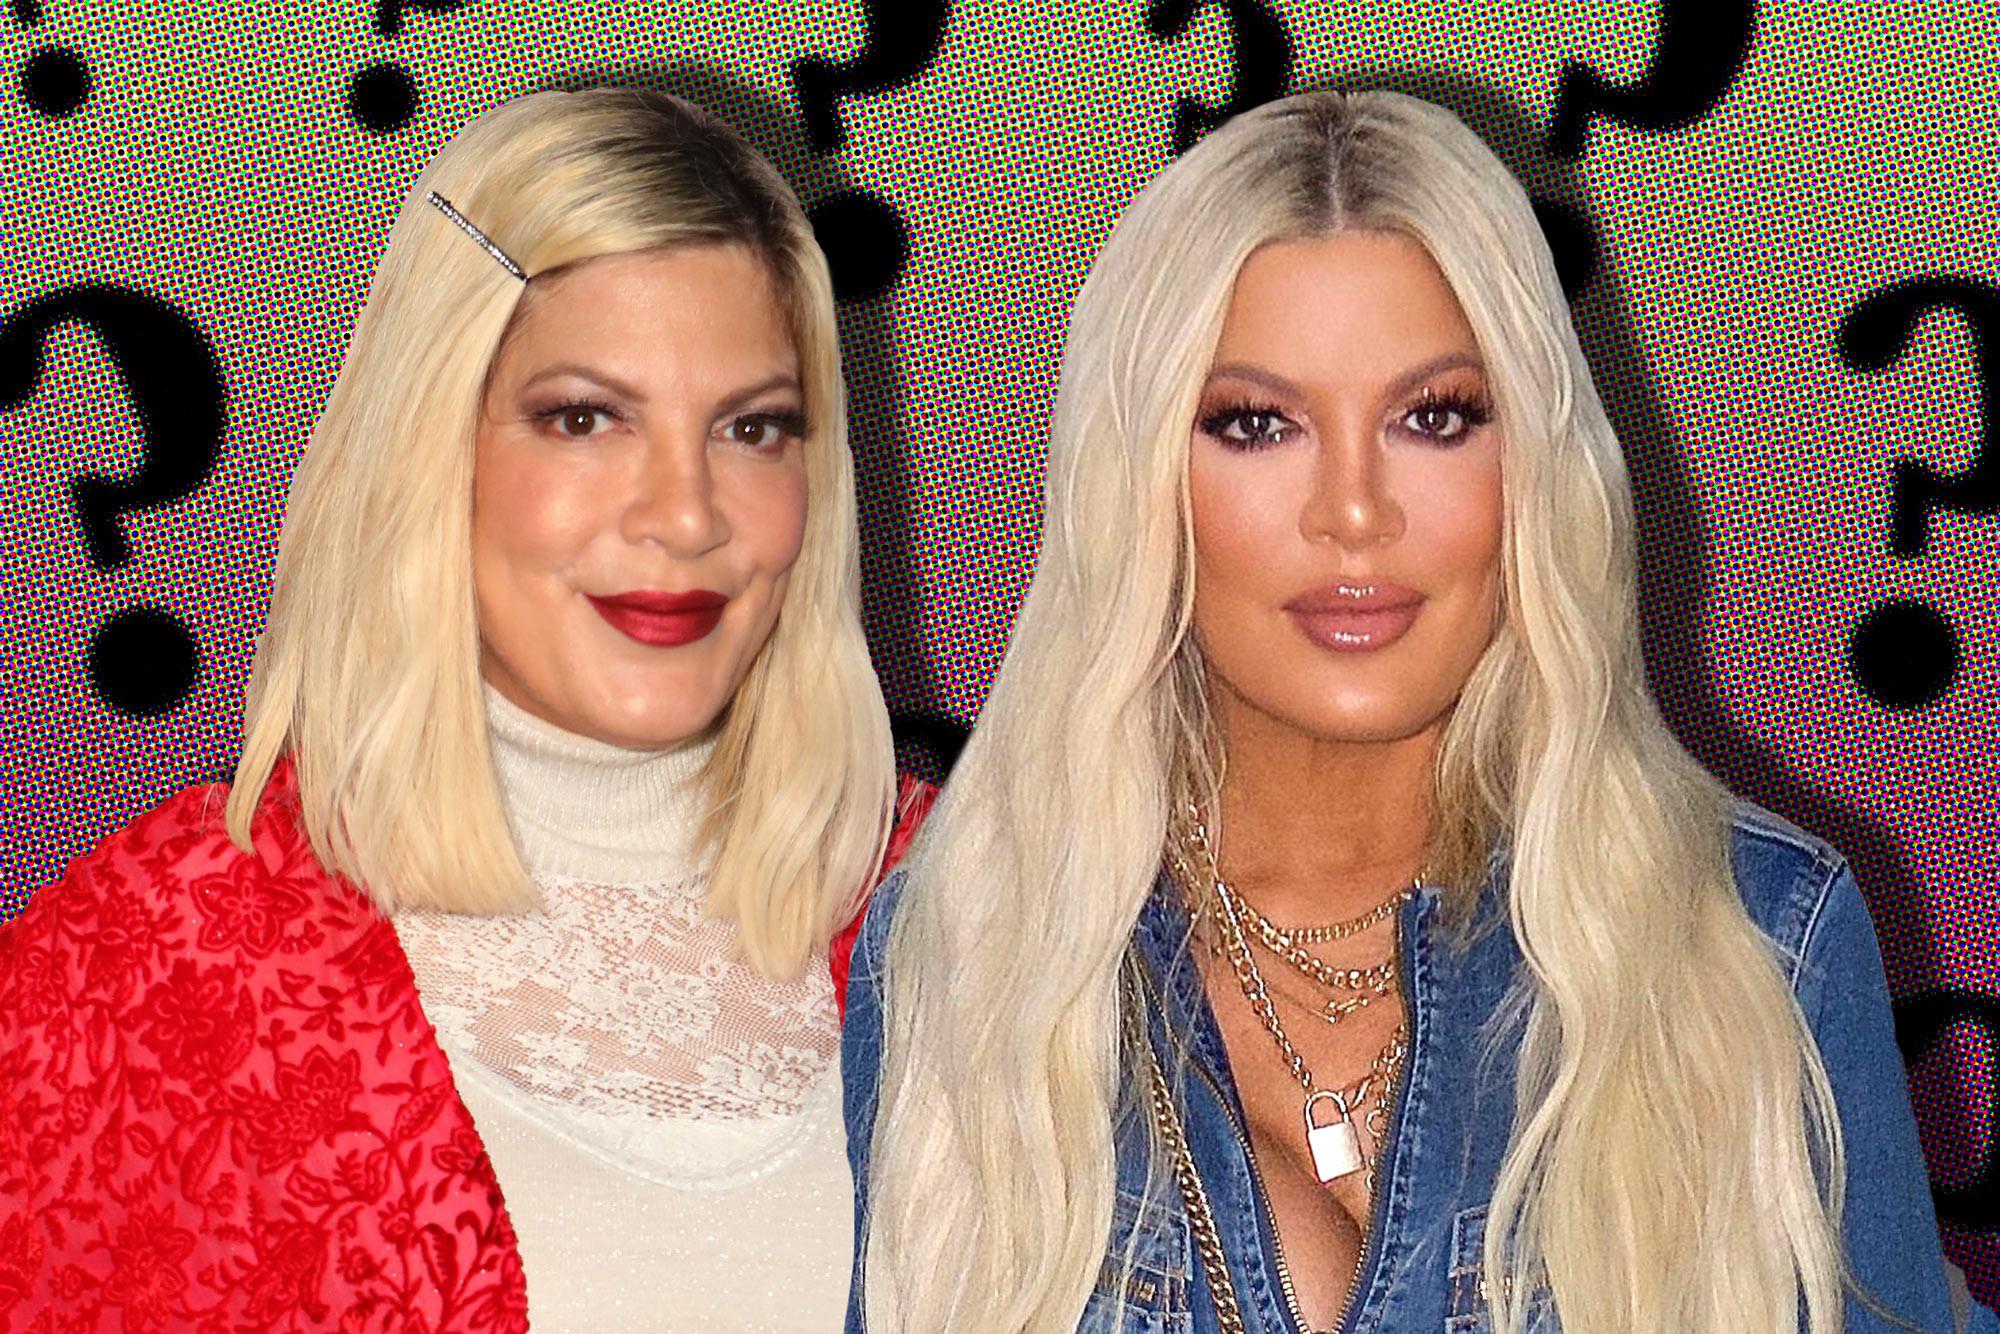 Tori Spelling And Khloe Kardashian Tori Response to Keeping Up With the Kardashians Star Comparisons!